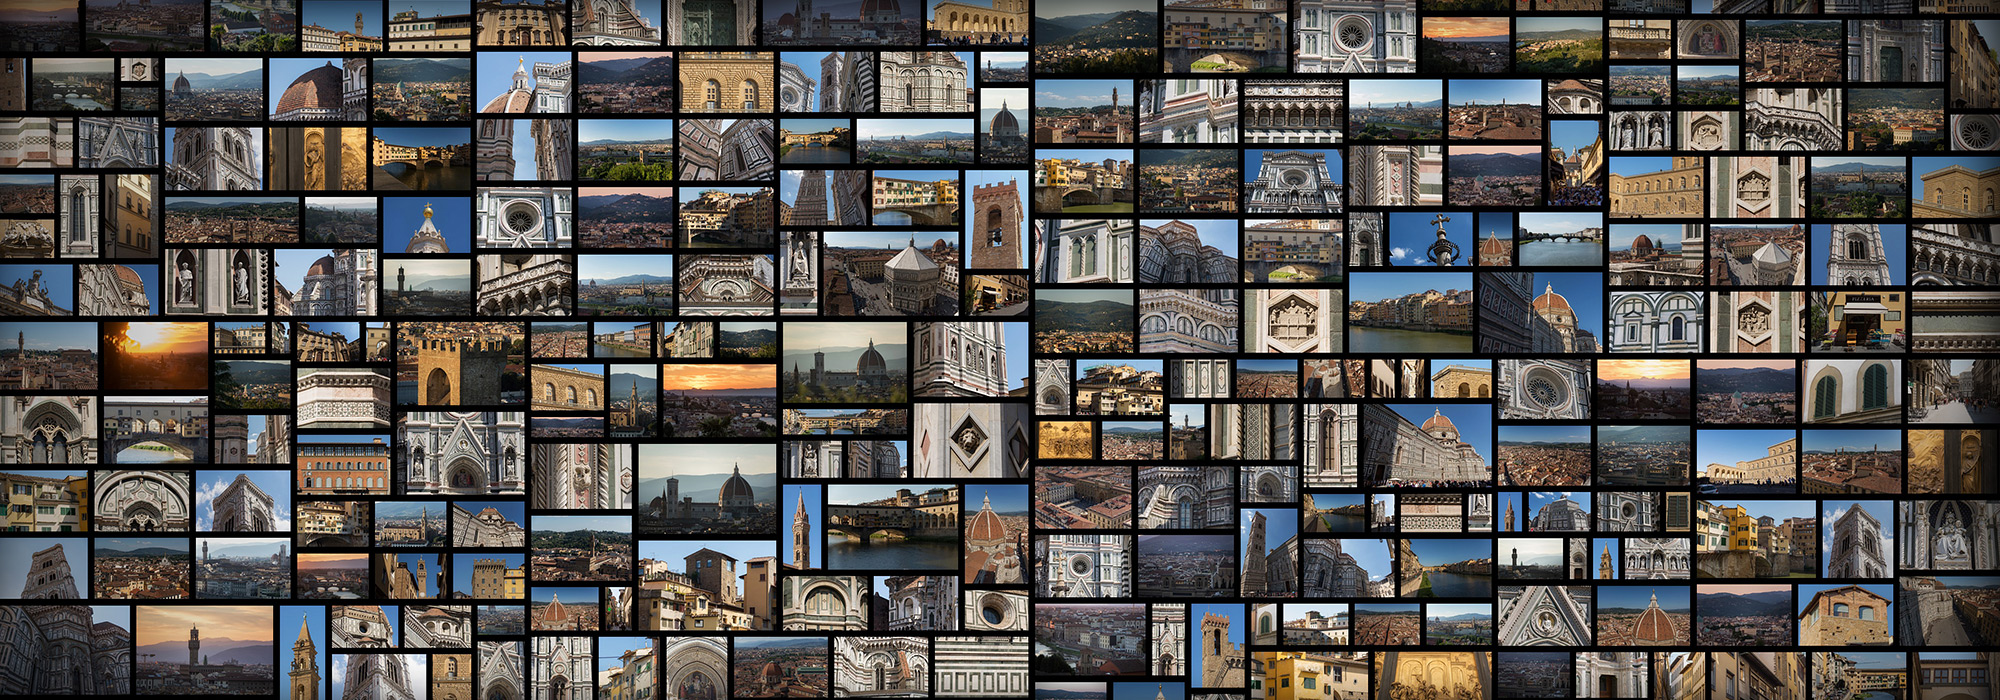 FlorenceCityItalianArchitecture